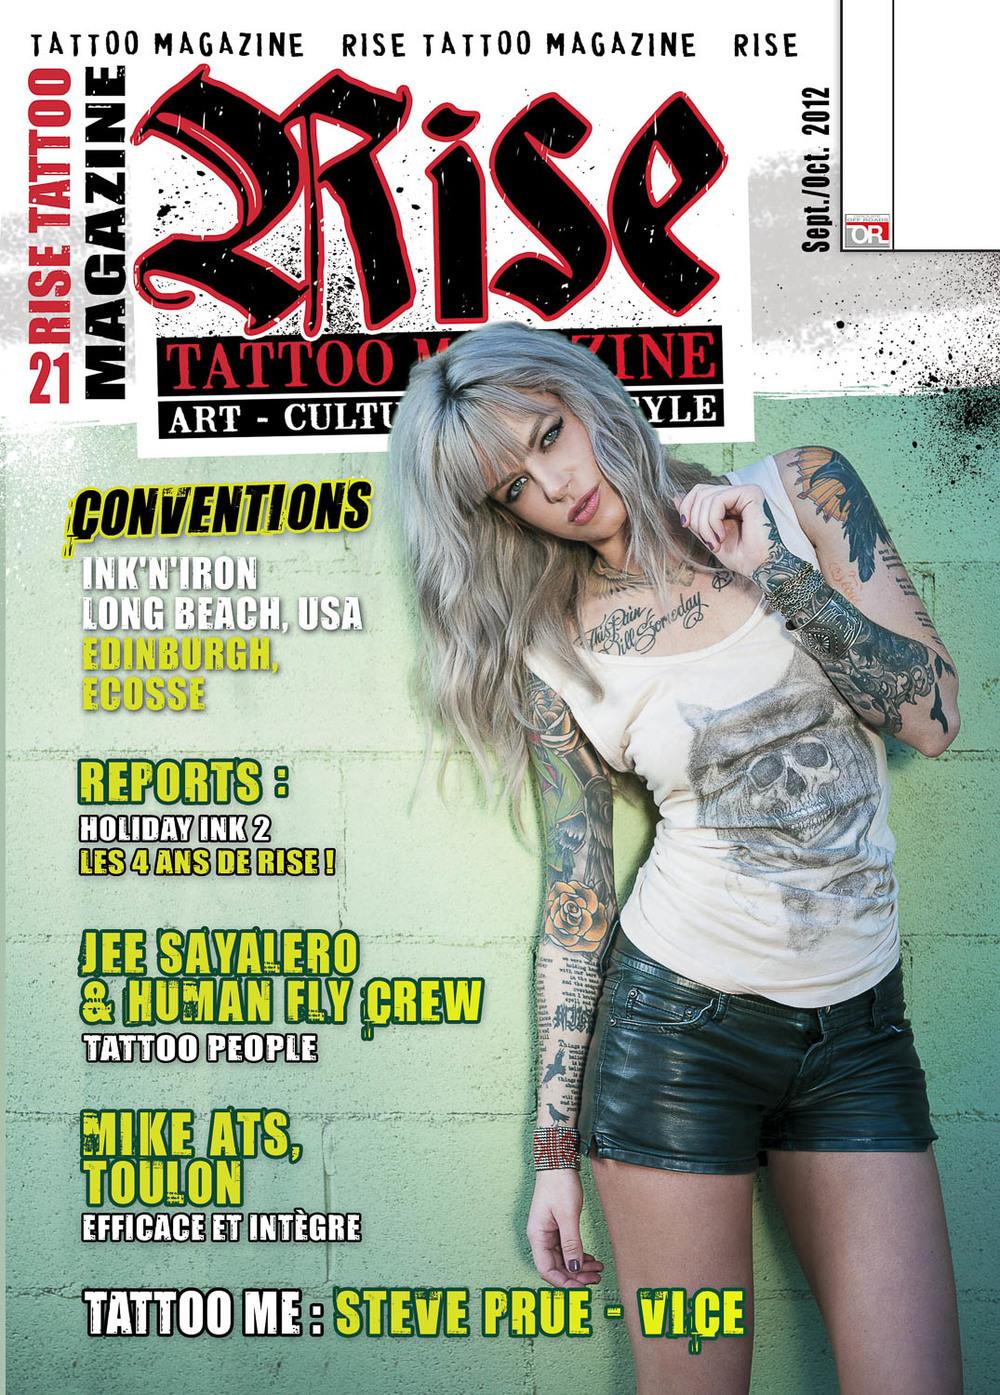 Rise tattoo magazine #21 / Samples